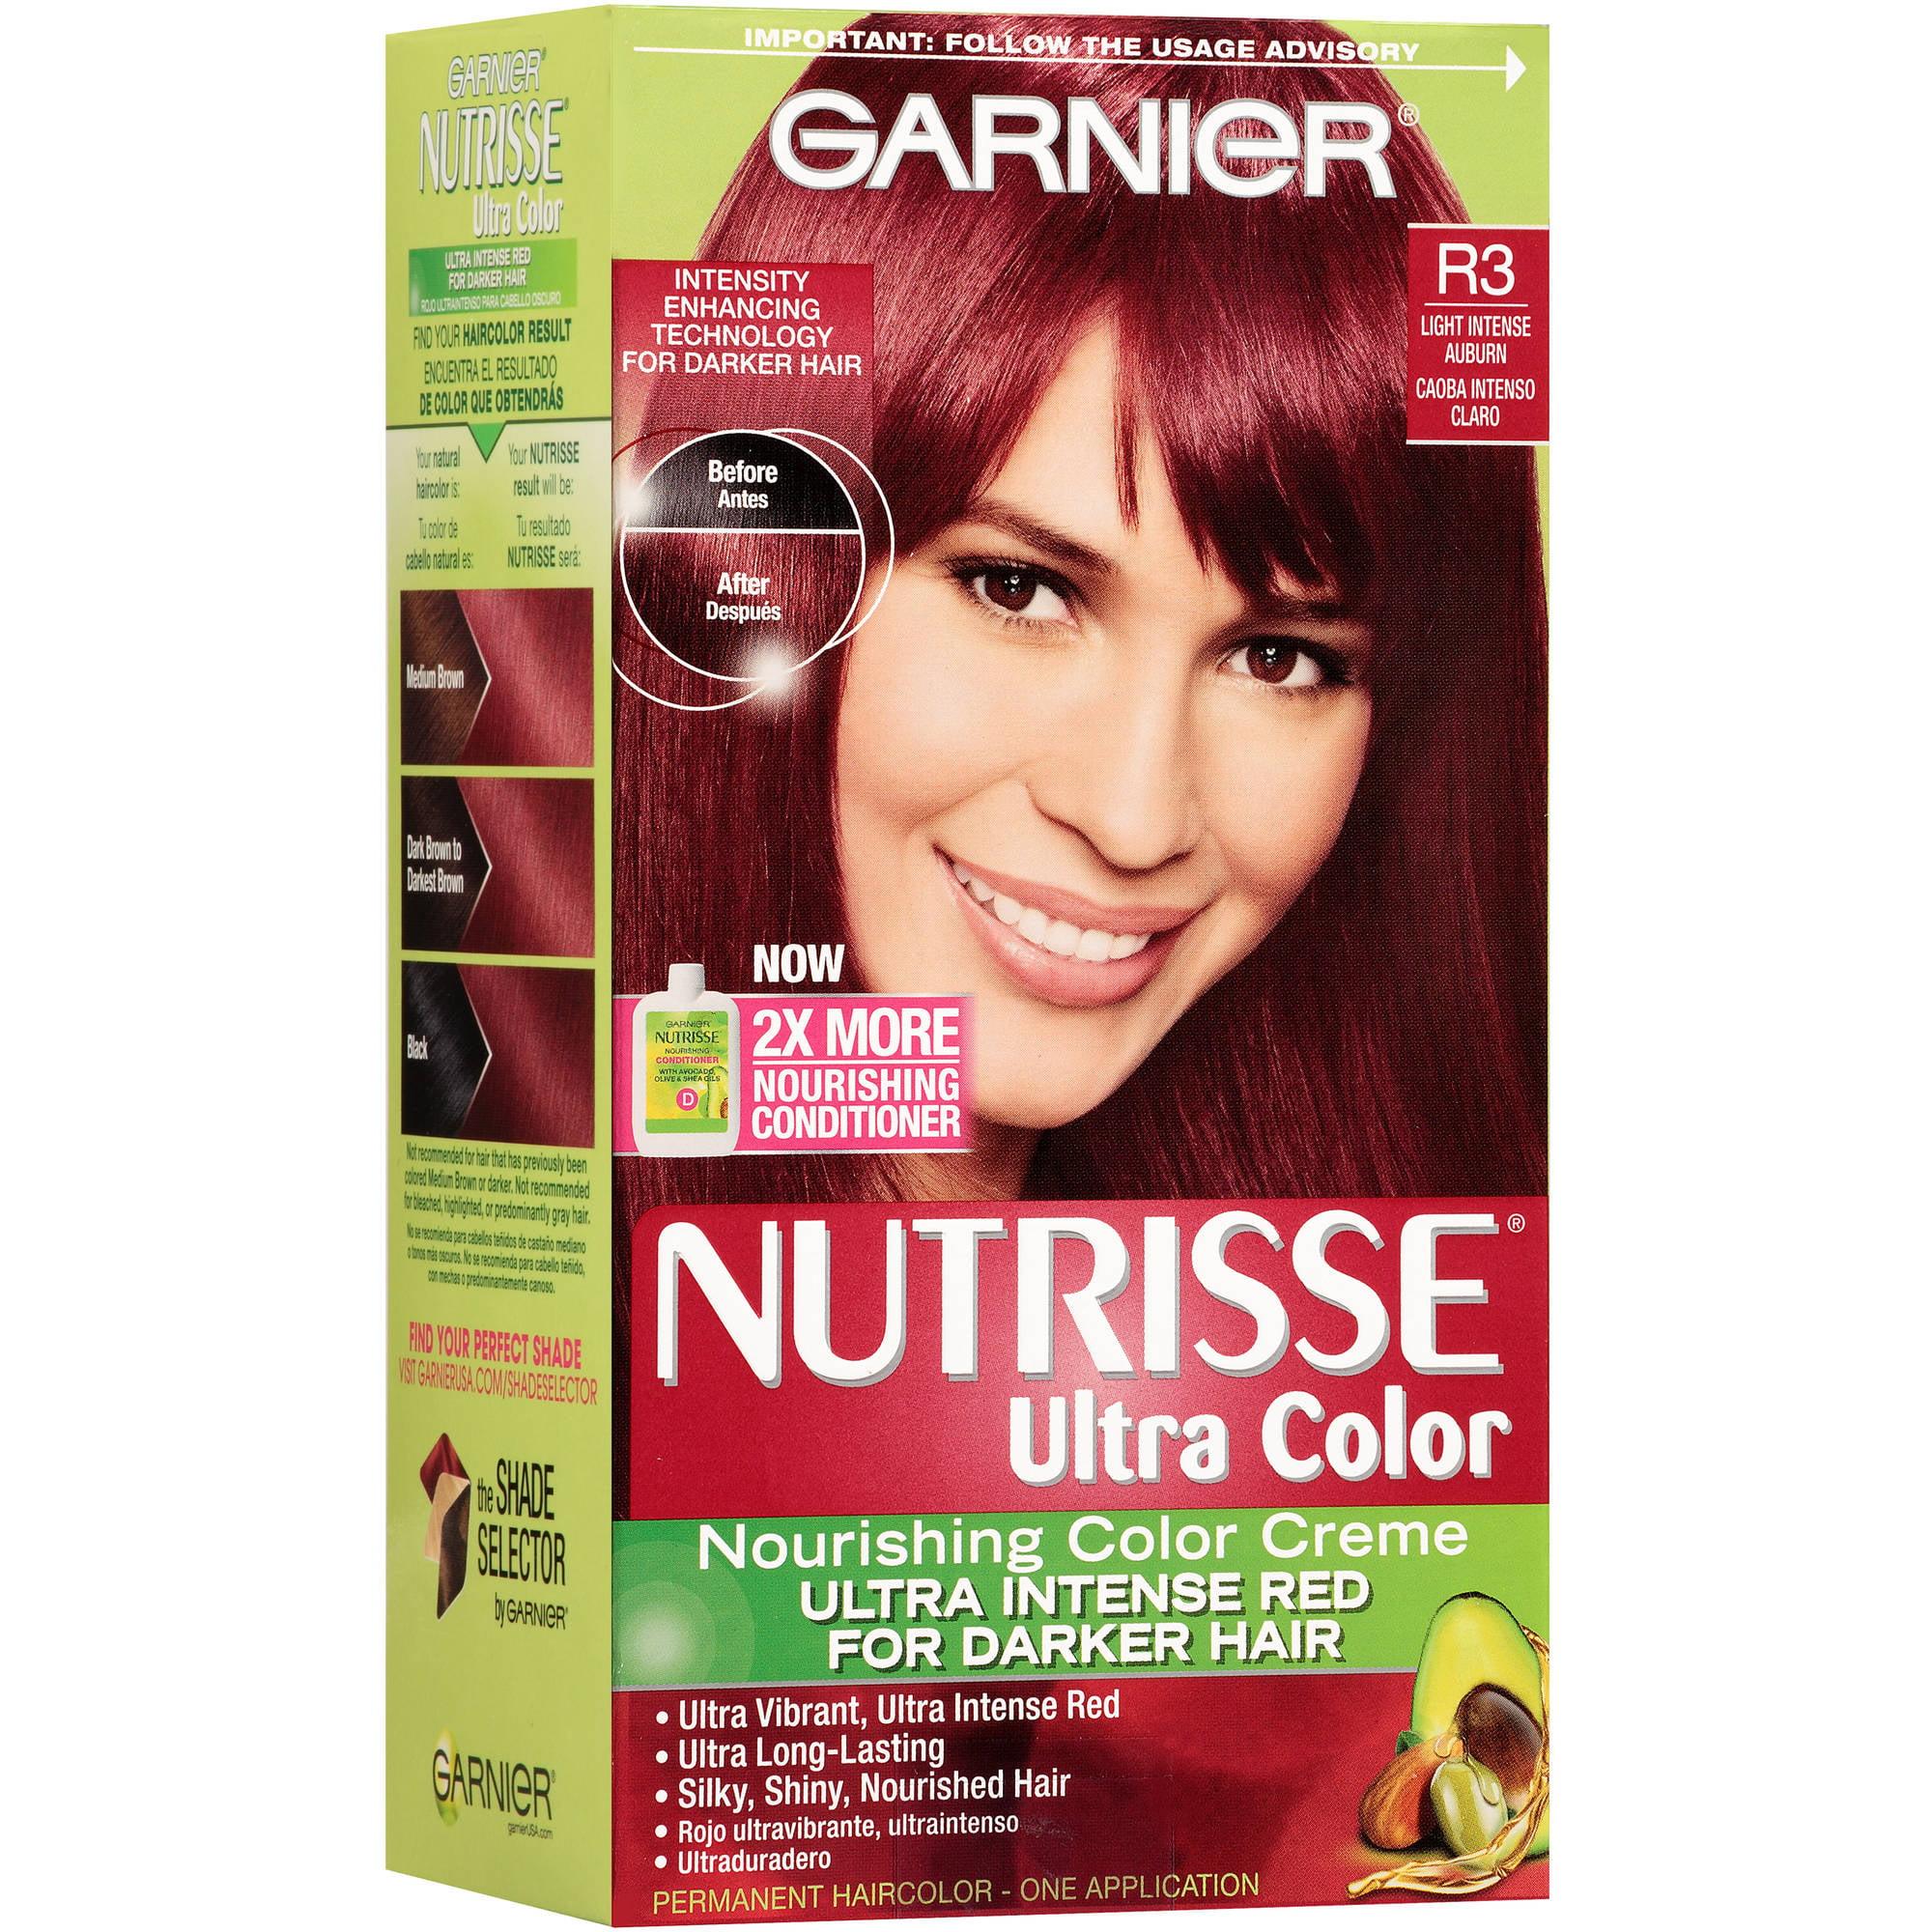 Garnier Nutrisse Ultra Color Haircolor